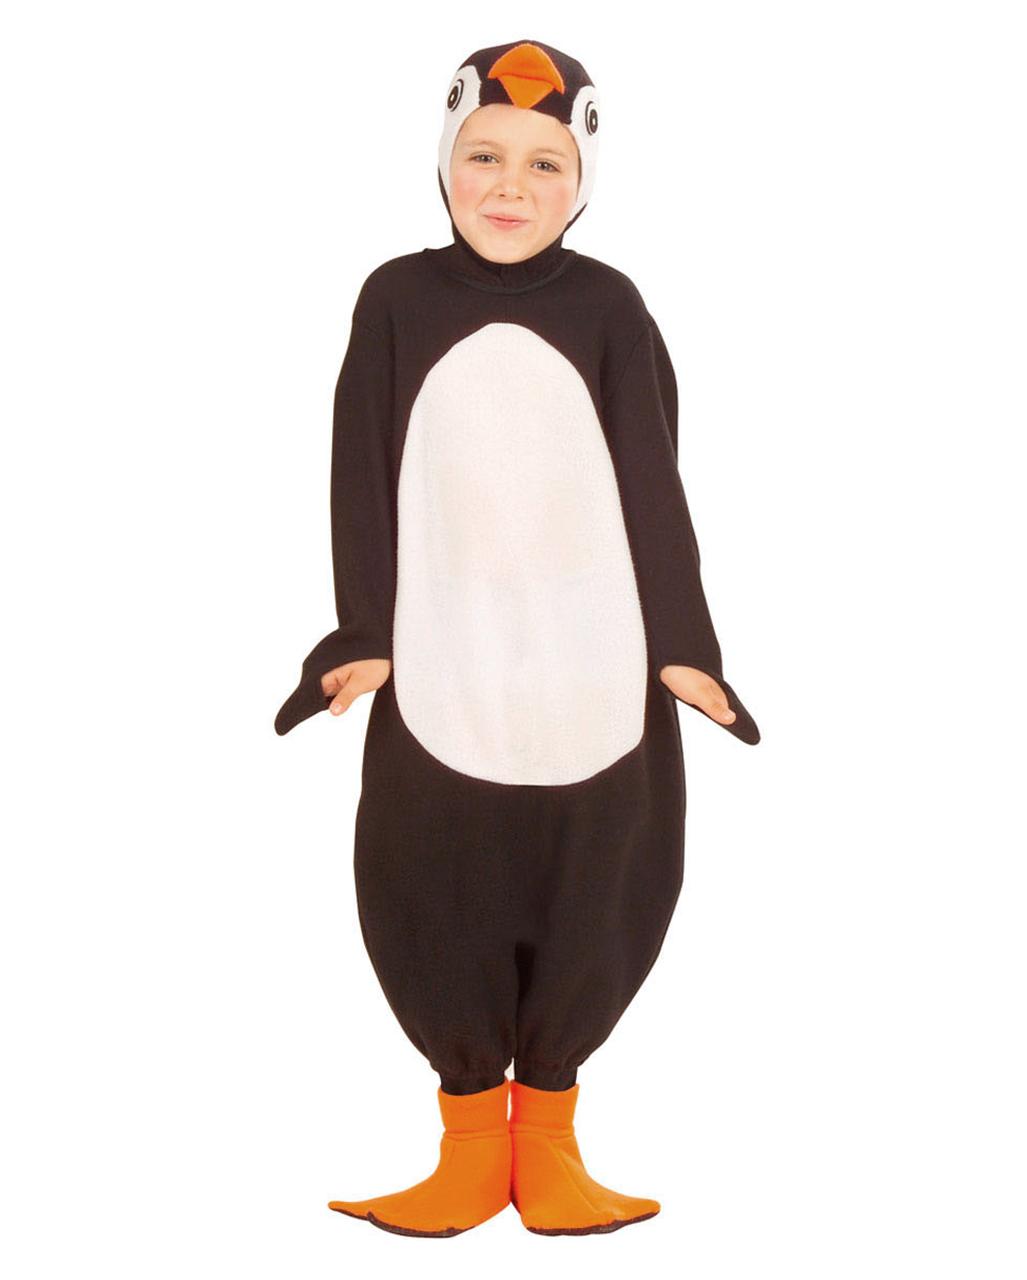 Penguin Kids Costume 110  sc 1 st  Horror-Shop.com & Penguin Kids Costume 110 Animal costumes for kids carnival costumes ...